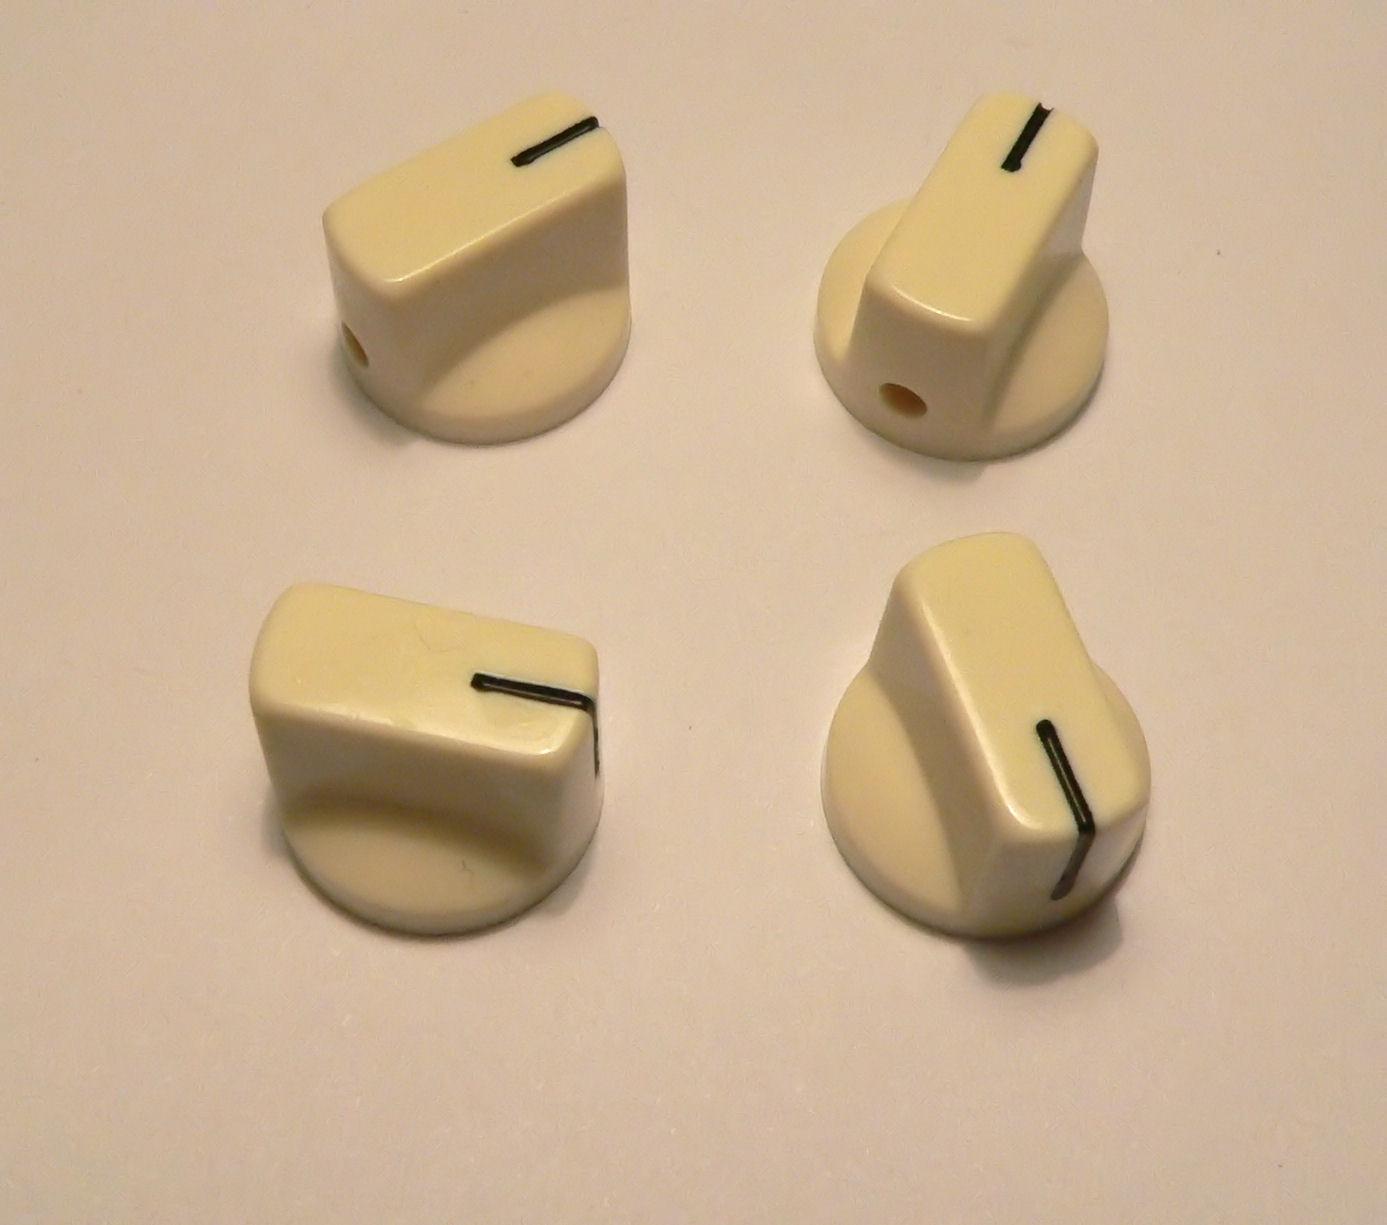 small cream knobs set of 4 for valve radio amplifier or guitar pedal knob ebay. Black Bedroom Furniture Sets. Home Design Ideas